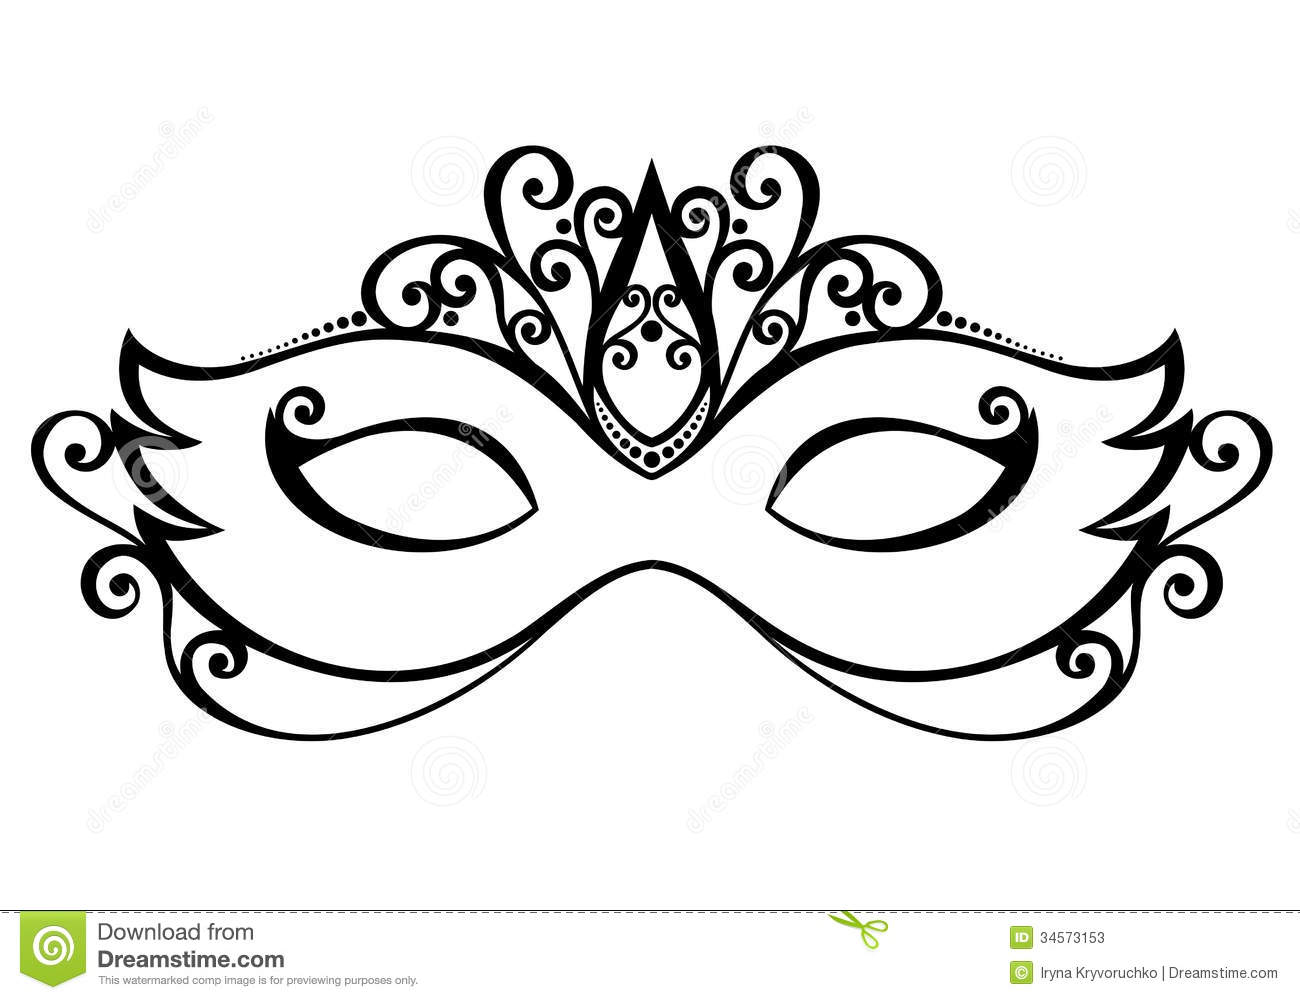 White clipart masquerade mask Our image White Mask delete